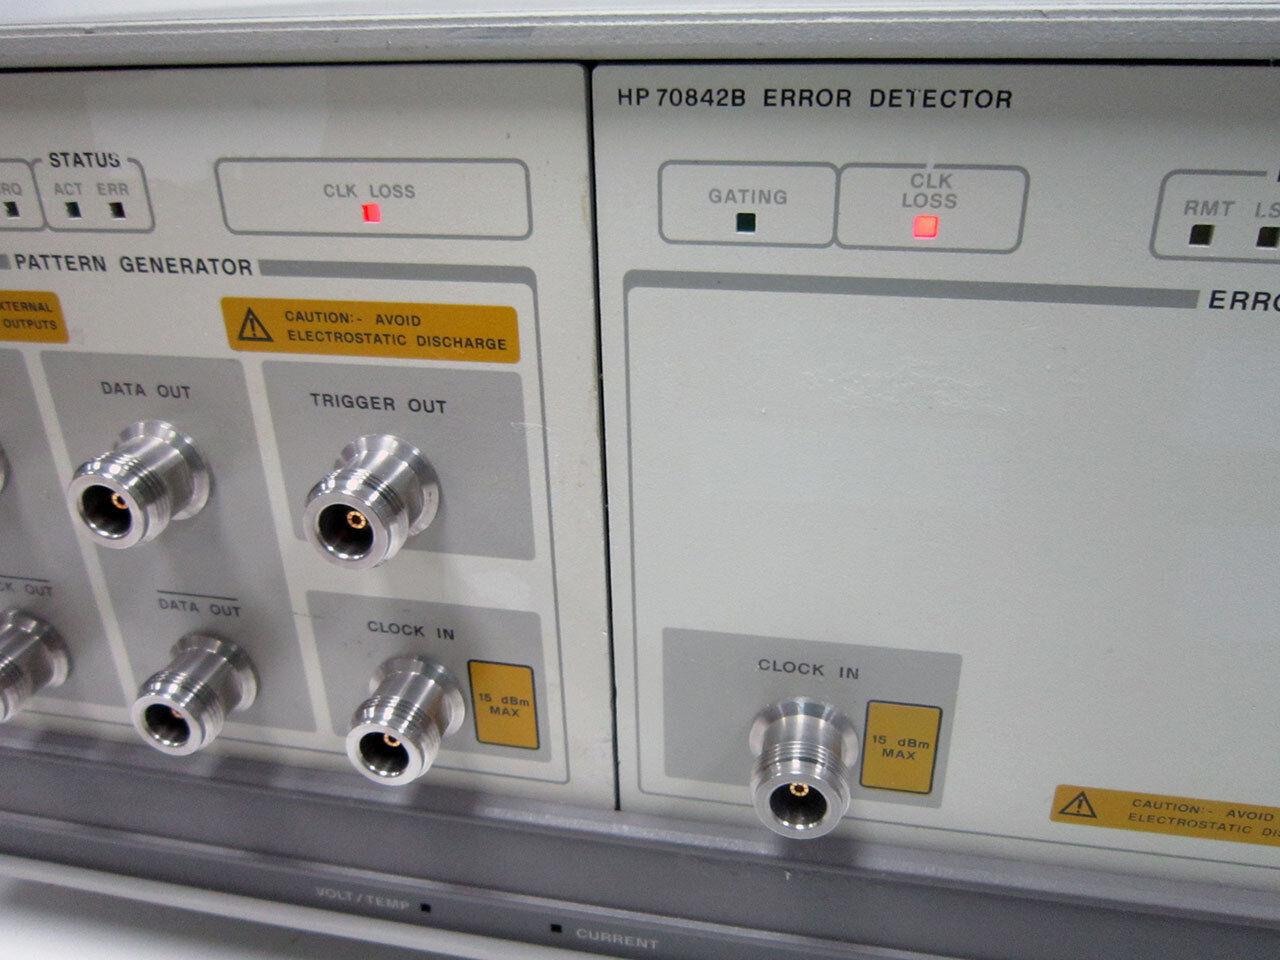 HP/AGILENT 70001A mainframe W/ 70841B Pattern Gen